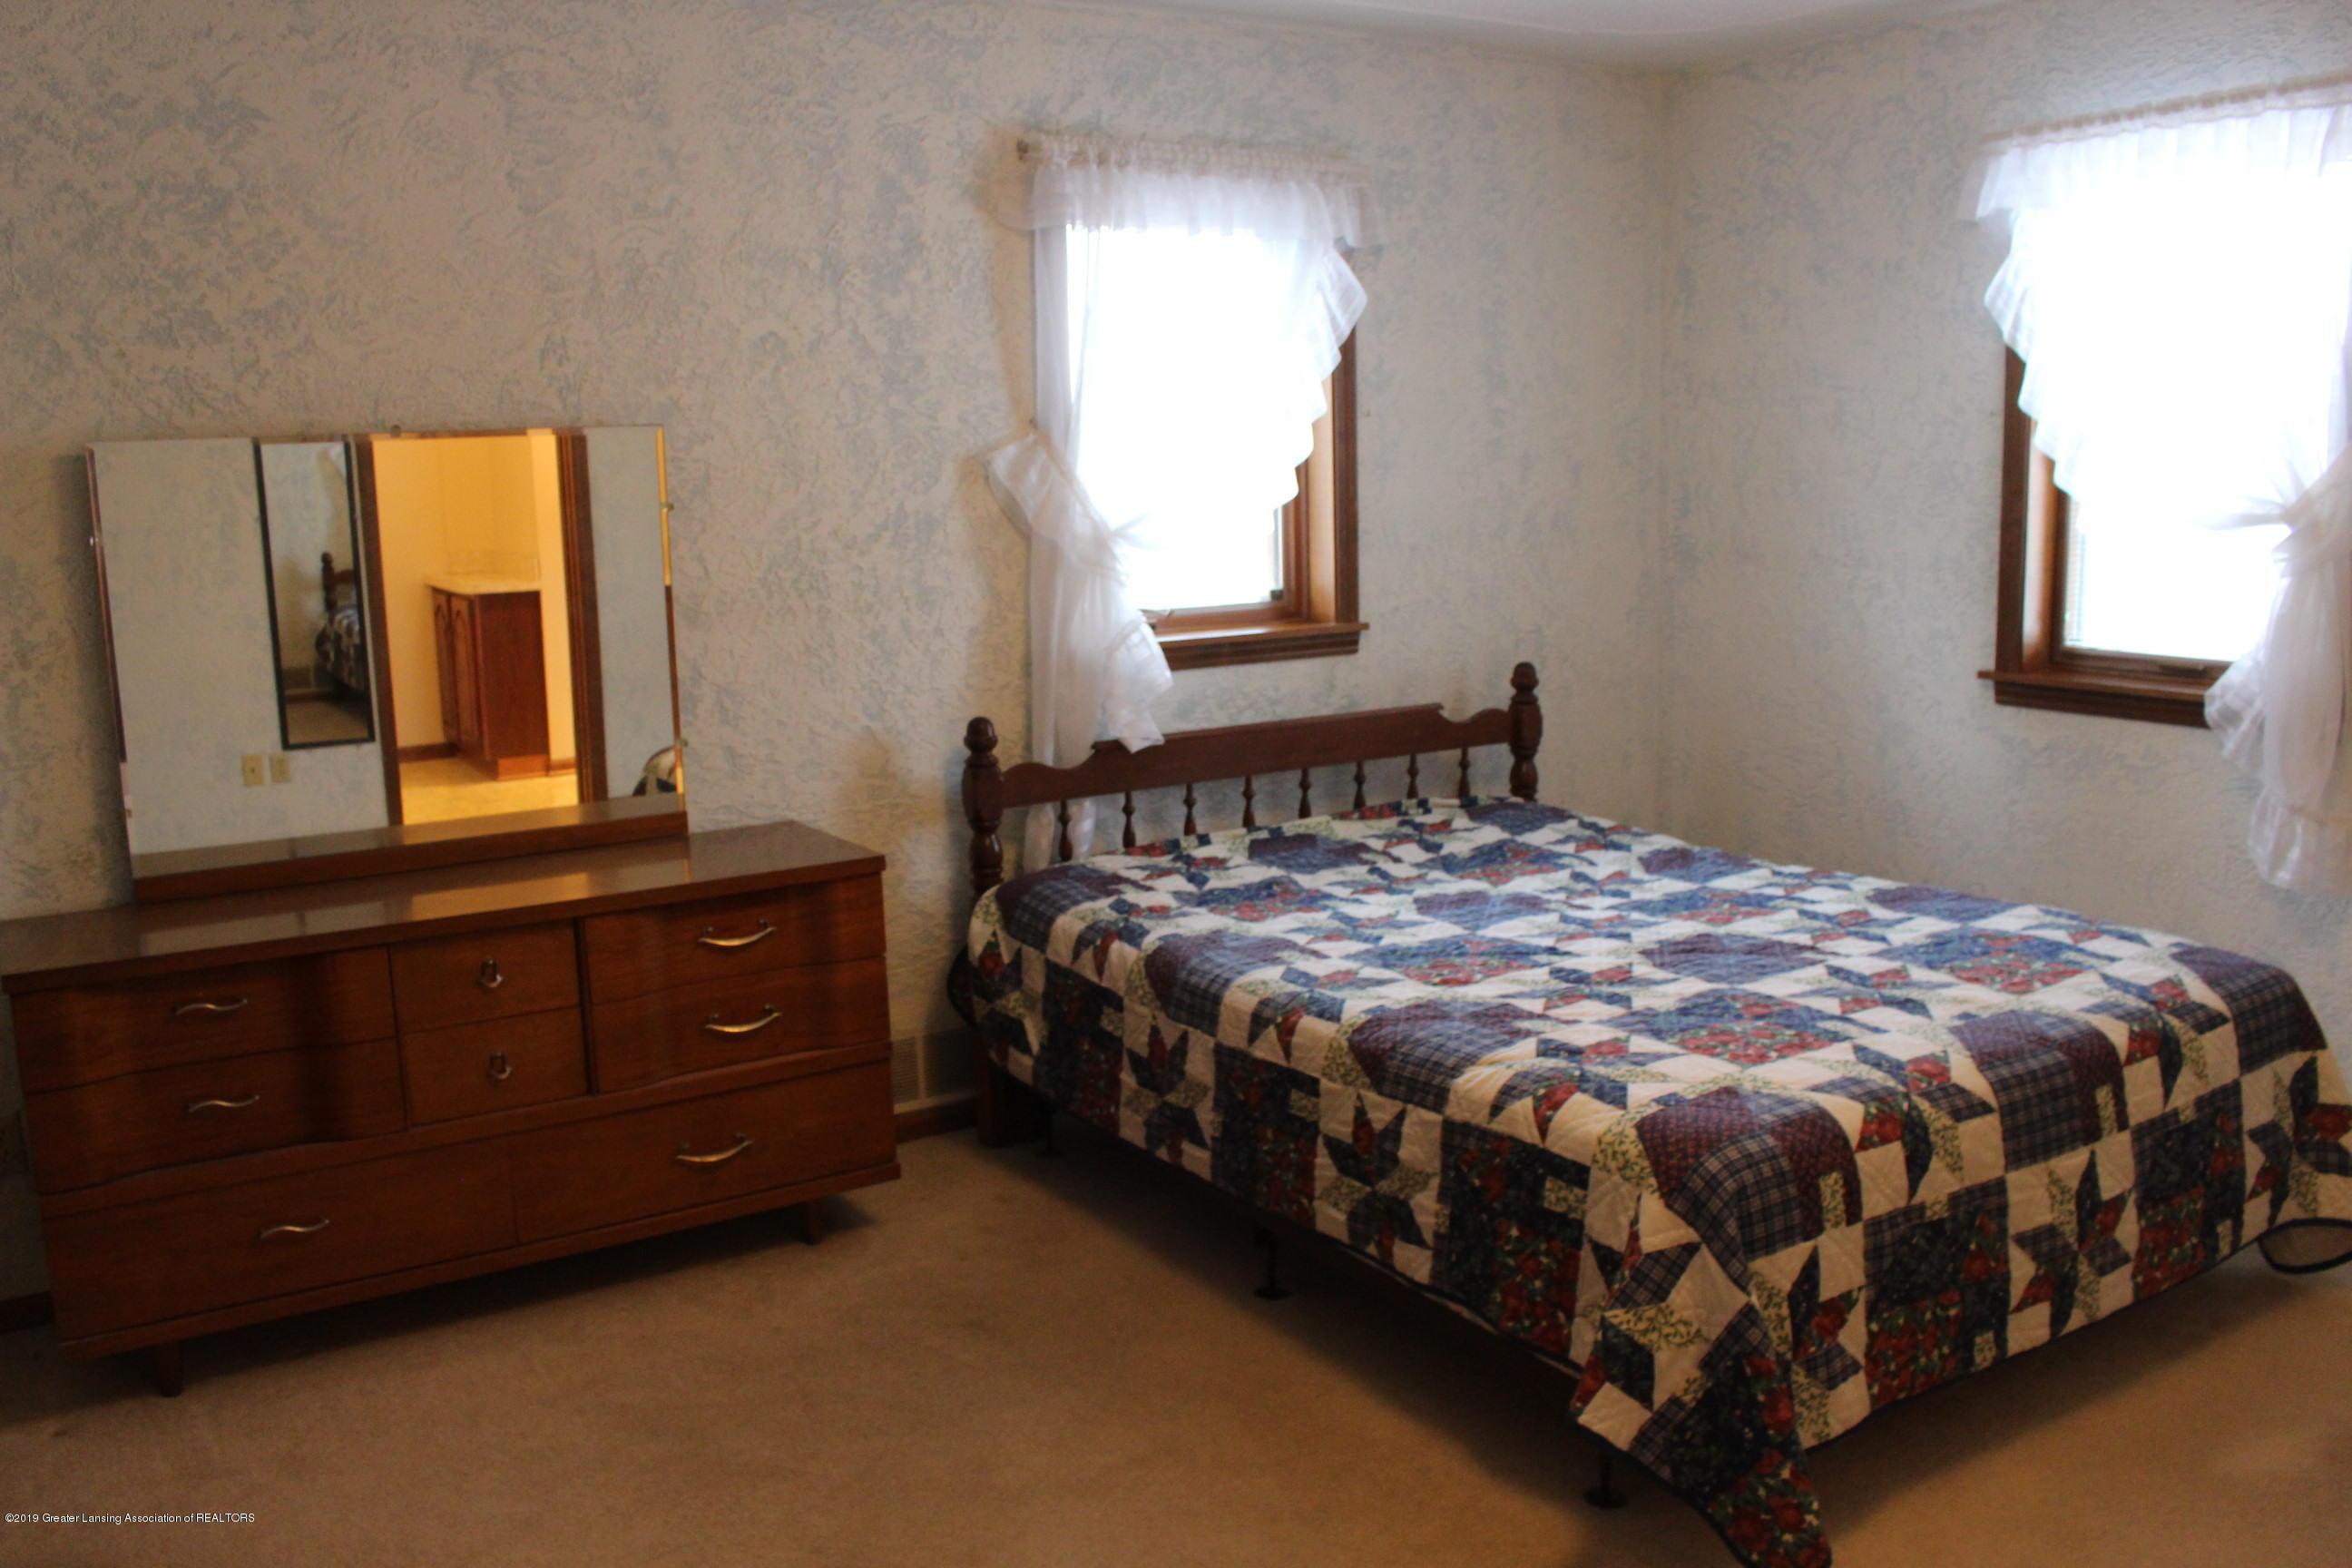 436 N Maple St - Master Bedroom - 9